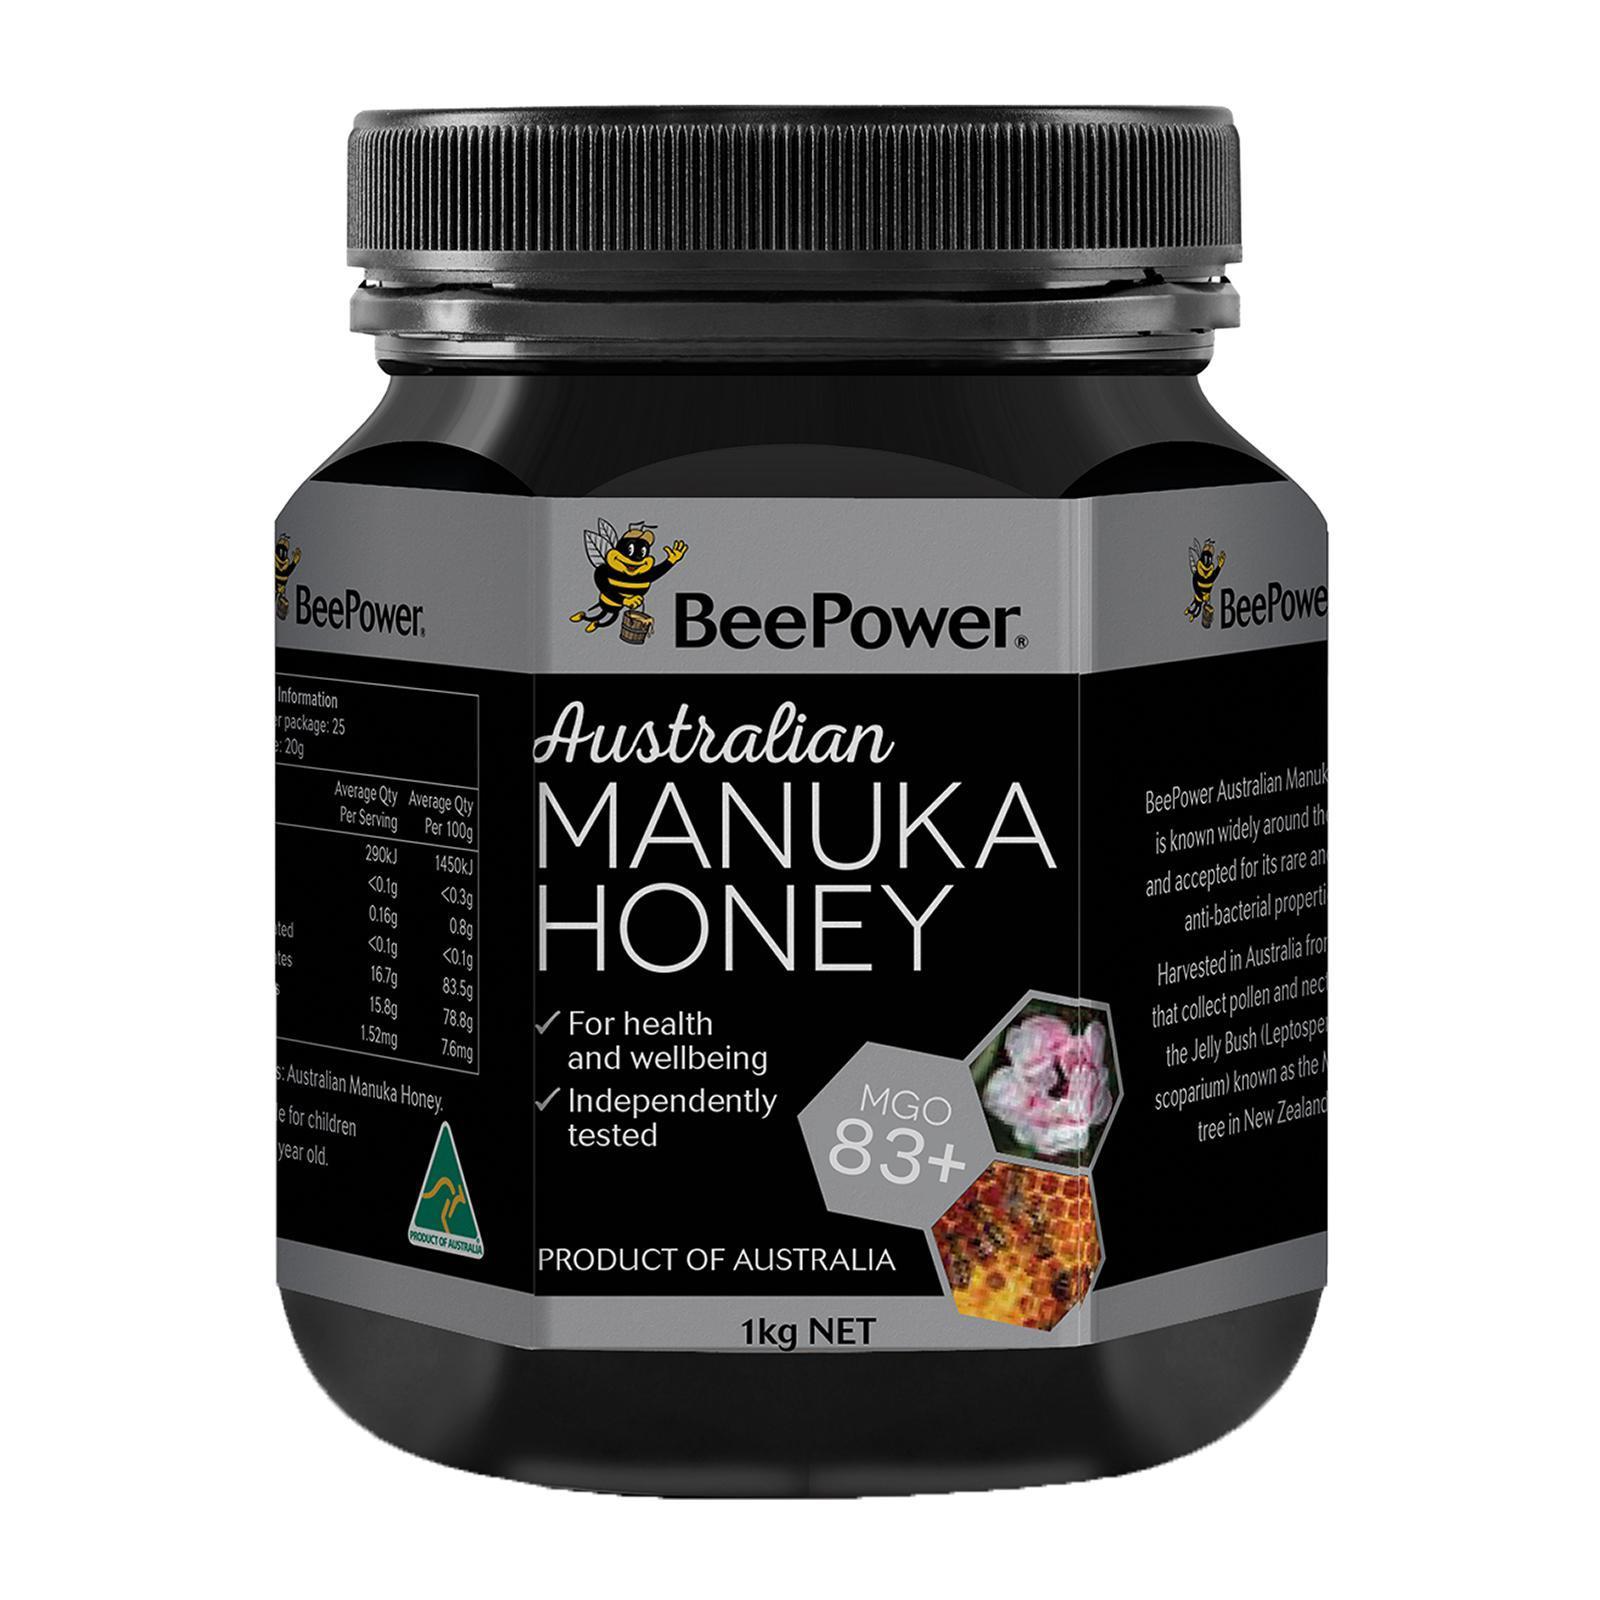 BeePower Australian Manuka Honey MGO 83+ - By Nature's Nutrition